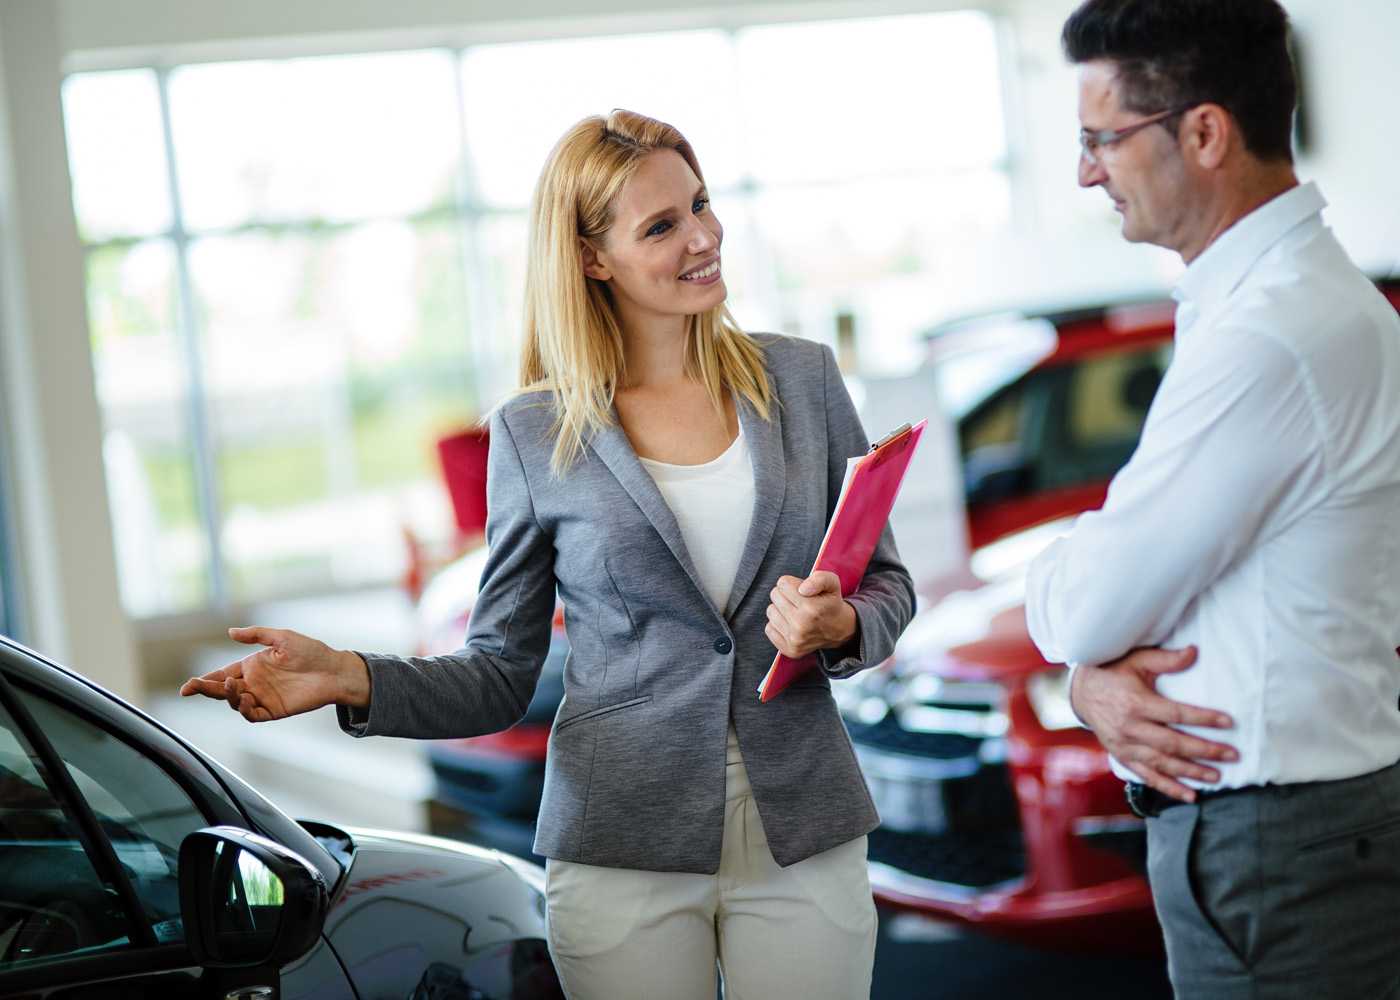 Women proud to work in transport sector despite macho culture